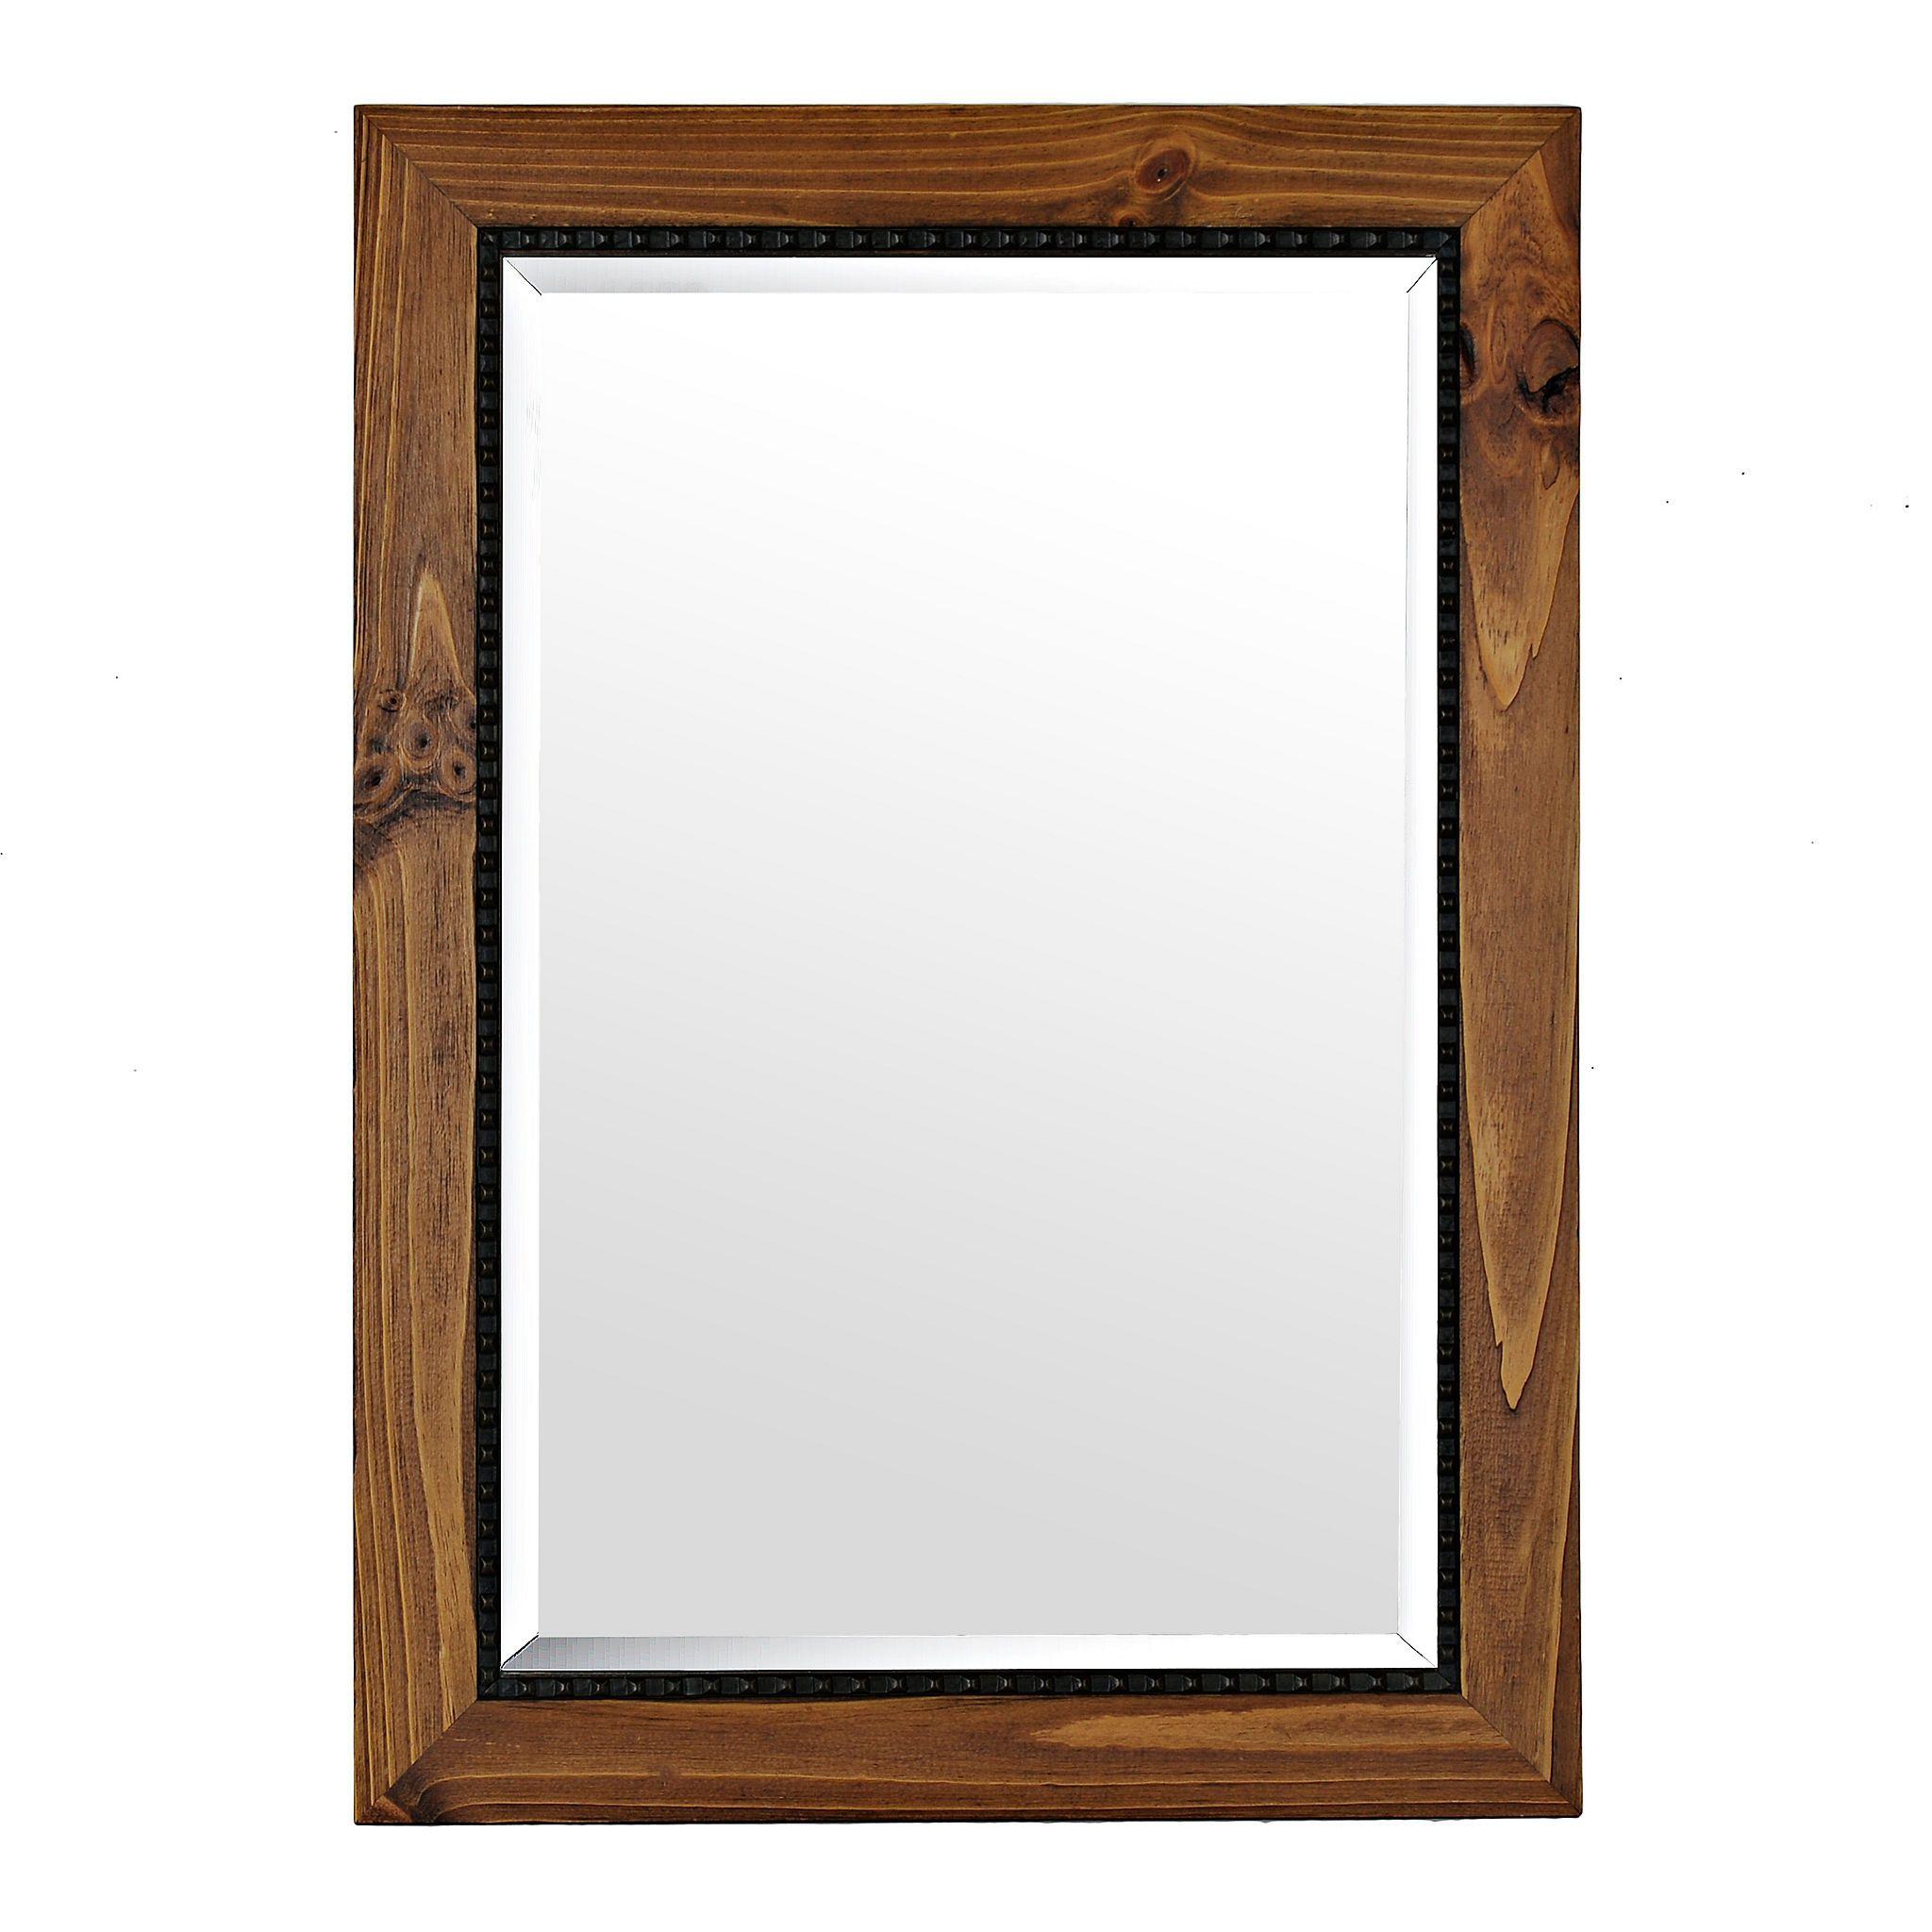 Barnwood Oak Framed Mirror, 31X43 In - Kirklands